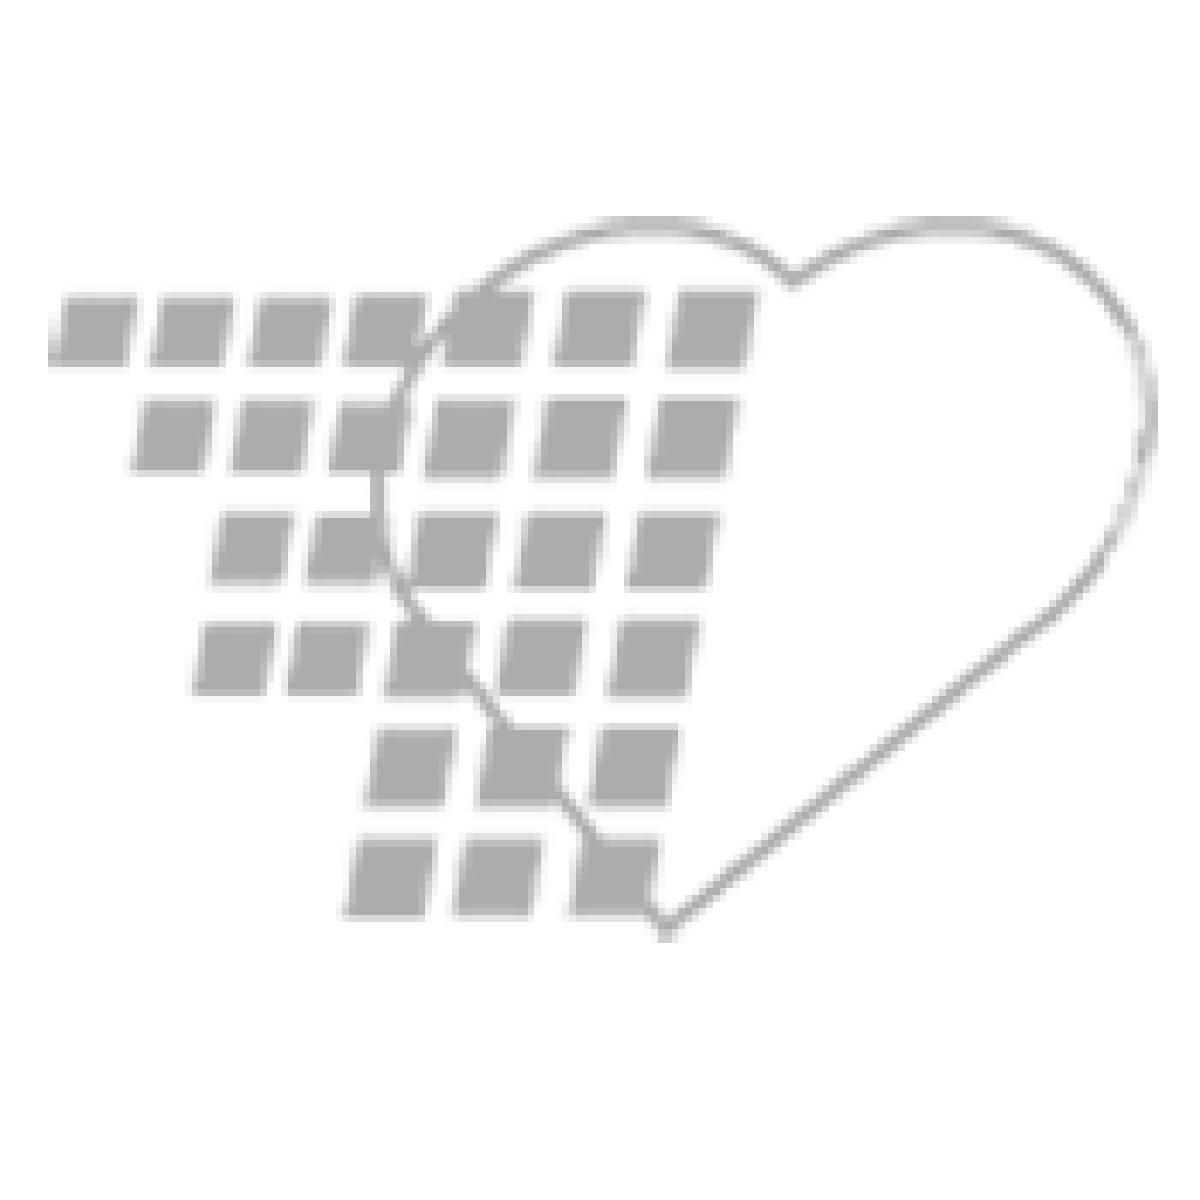 06-93-6100 - Demo Dose® Simulated FFP AB Rh Negative